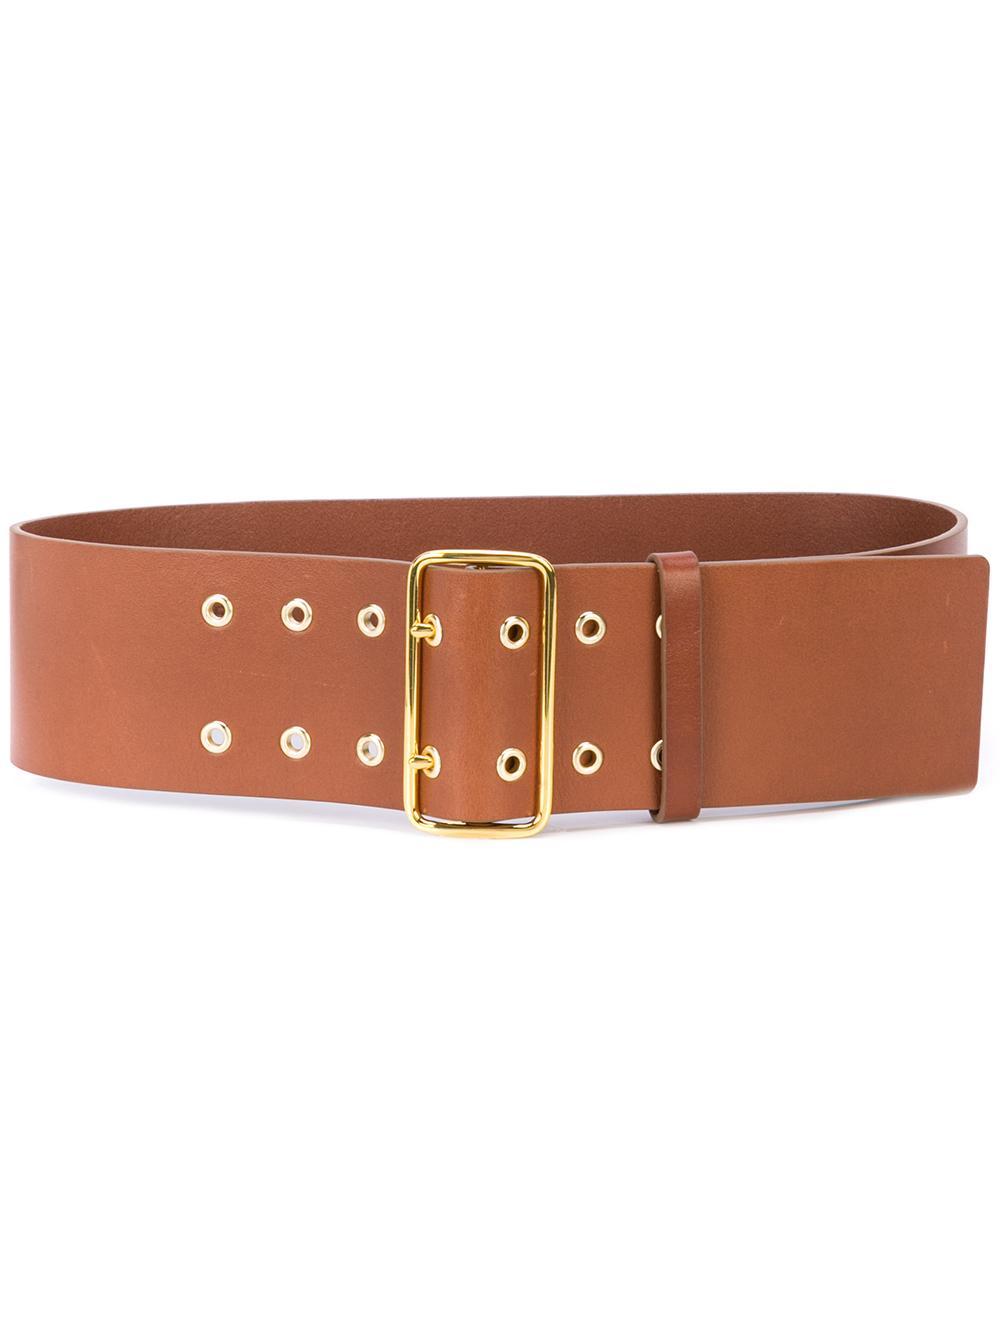 Double Grommet Wide Waist Belt Item # LWBT0076